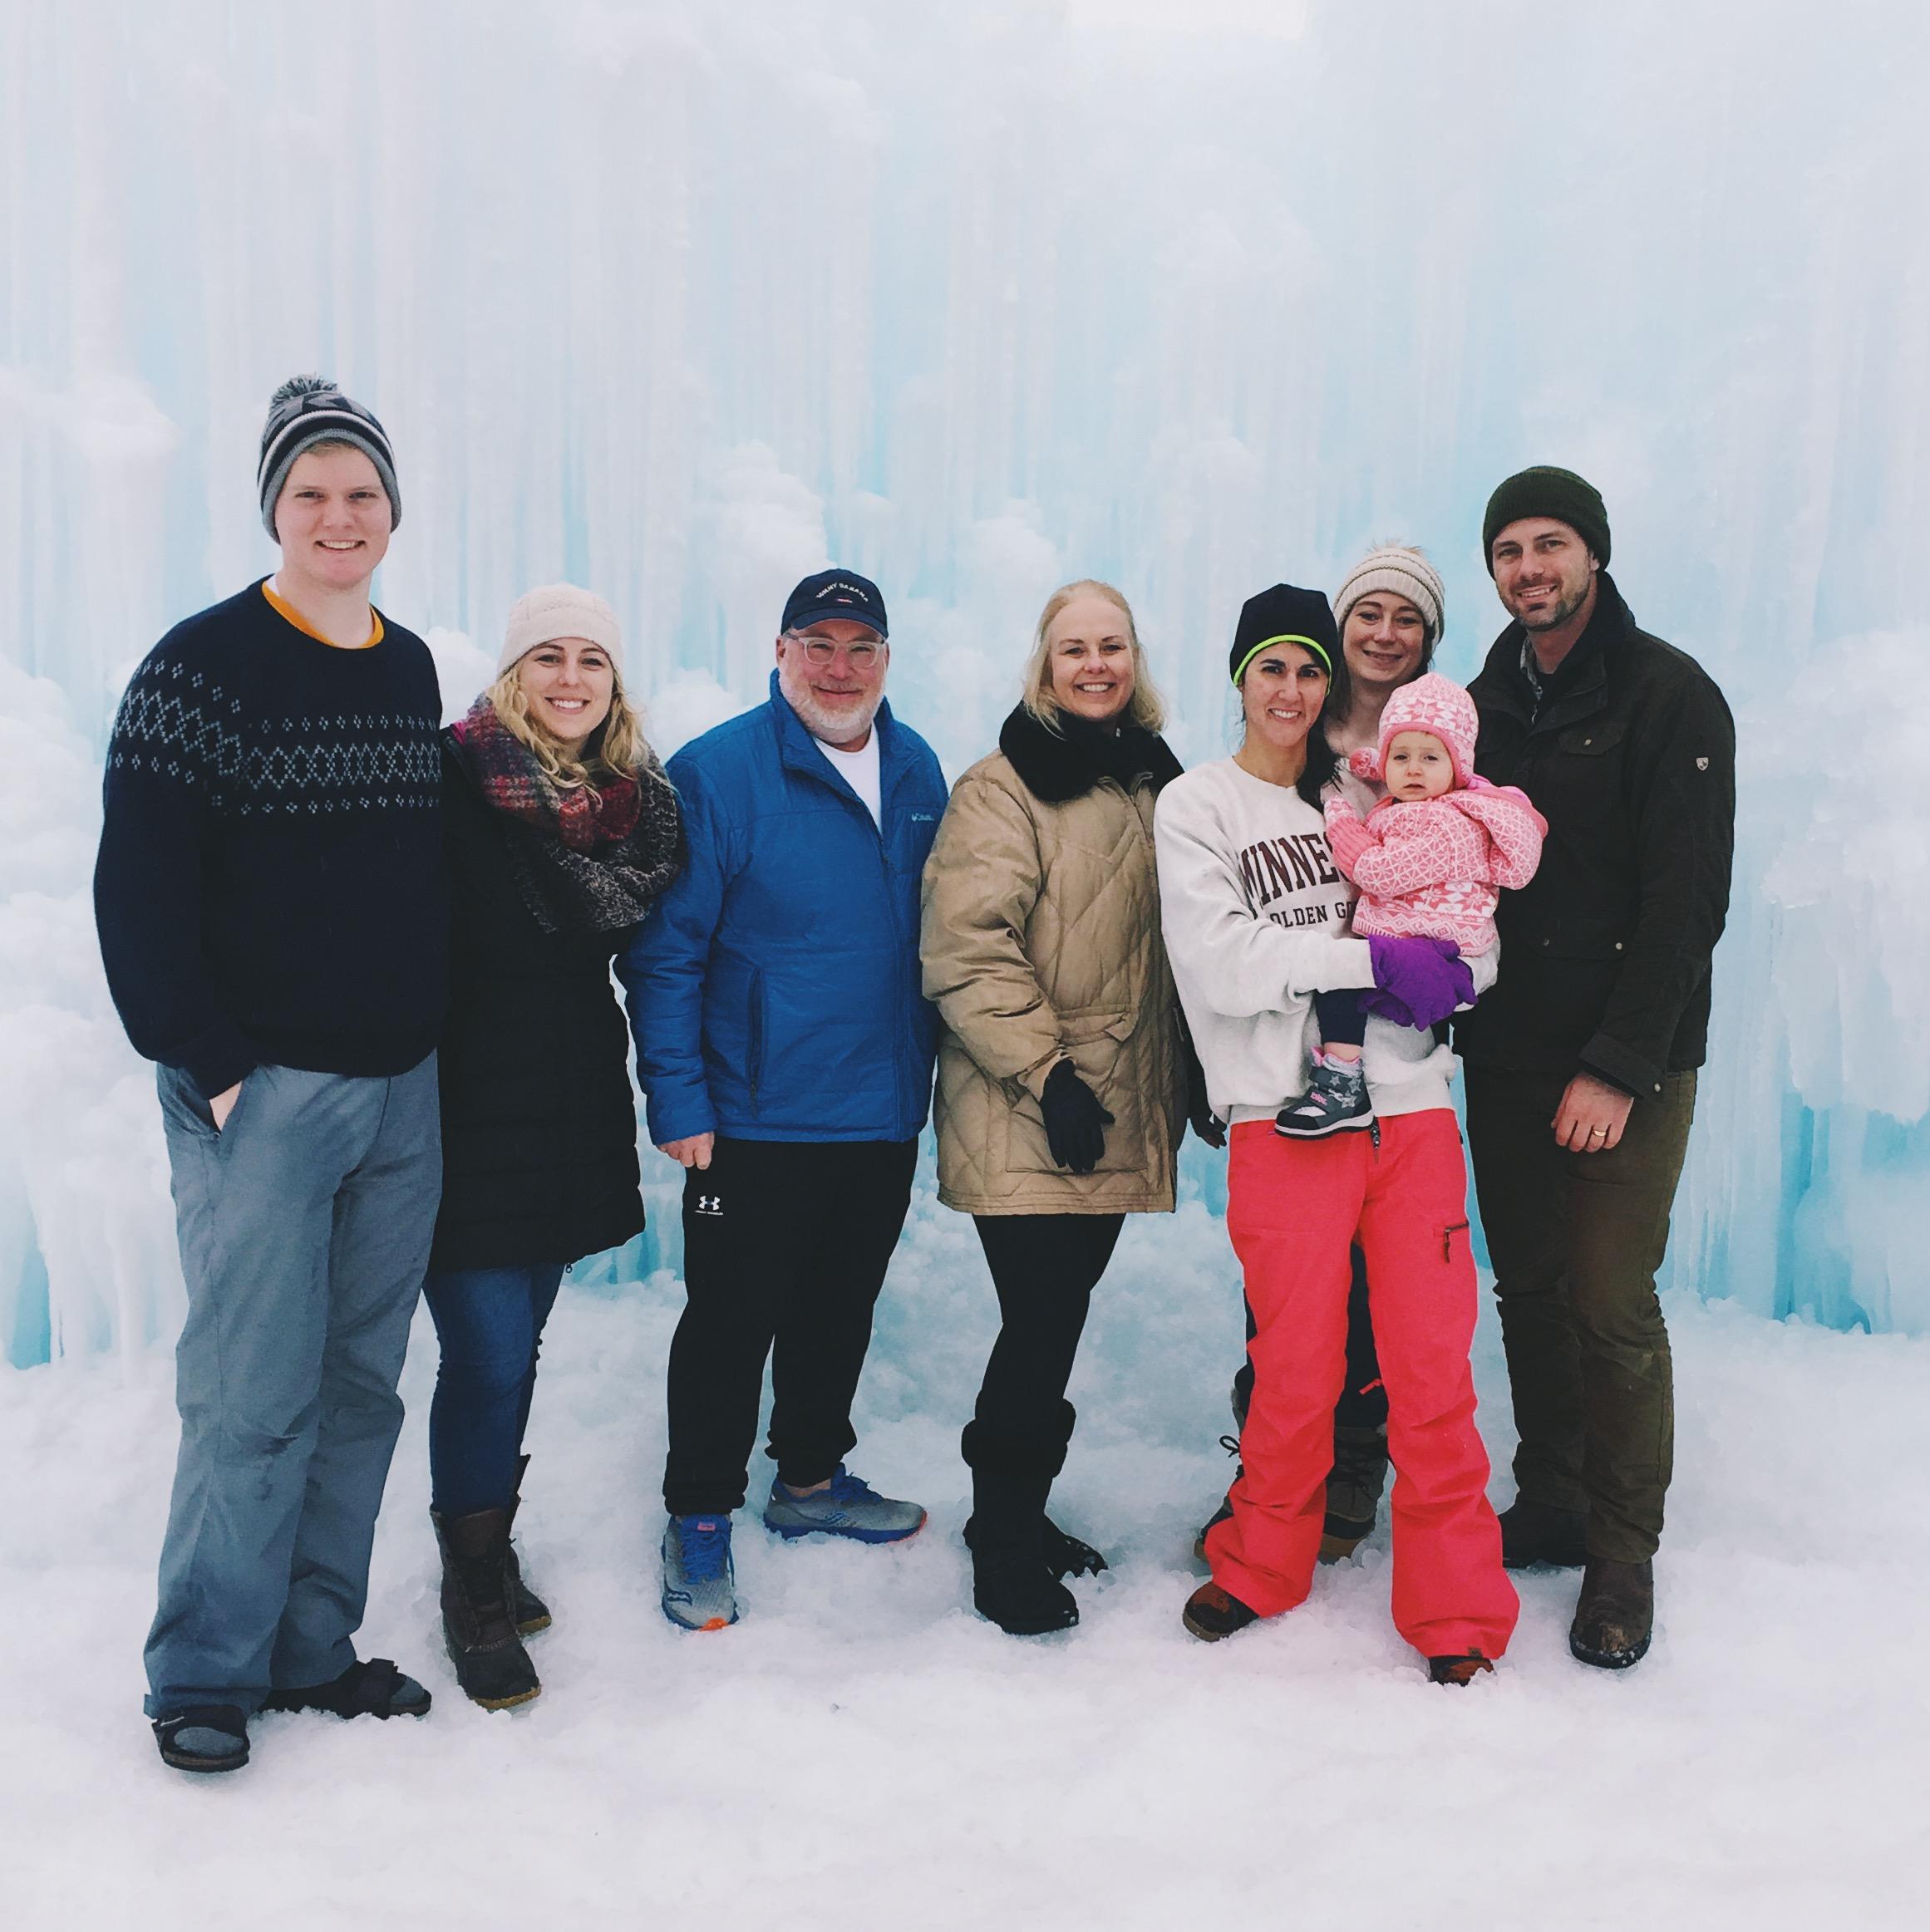 The group of us! — Matt, me, Dad, Marian, Mandy, Clair, Luke